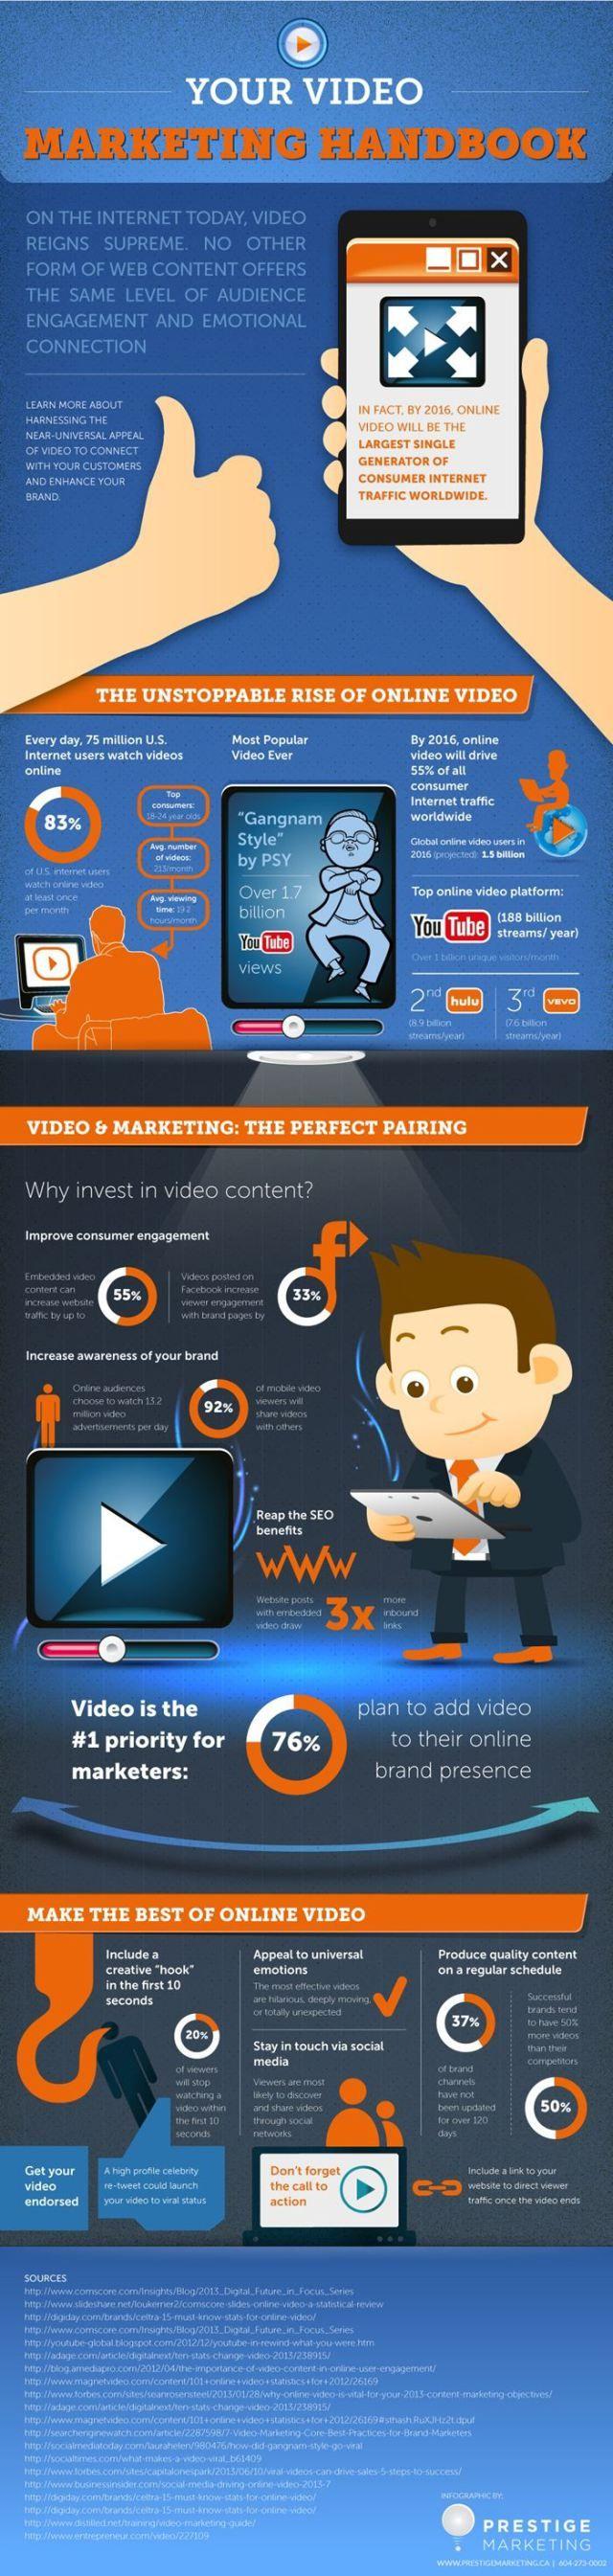 Your video marketing handbook #infographic #marketing